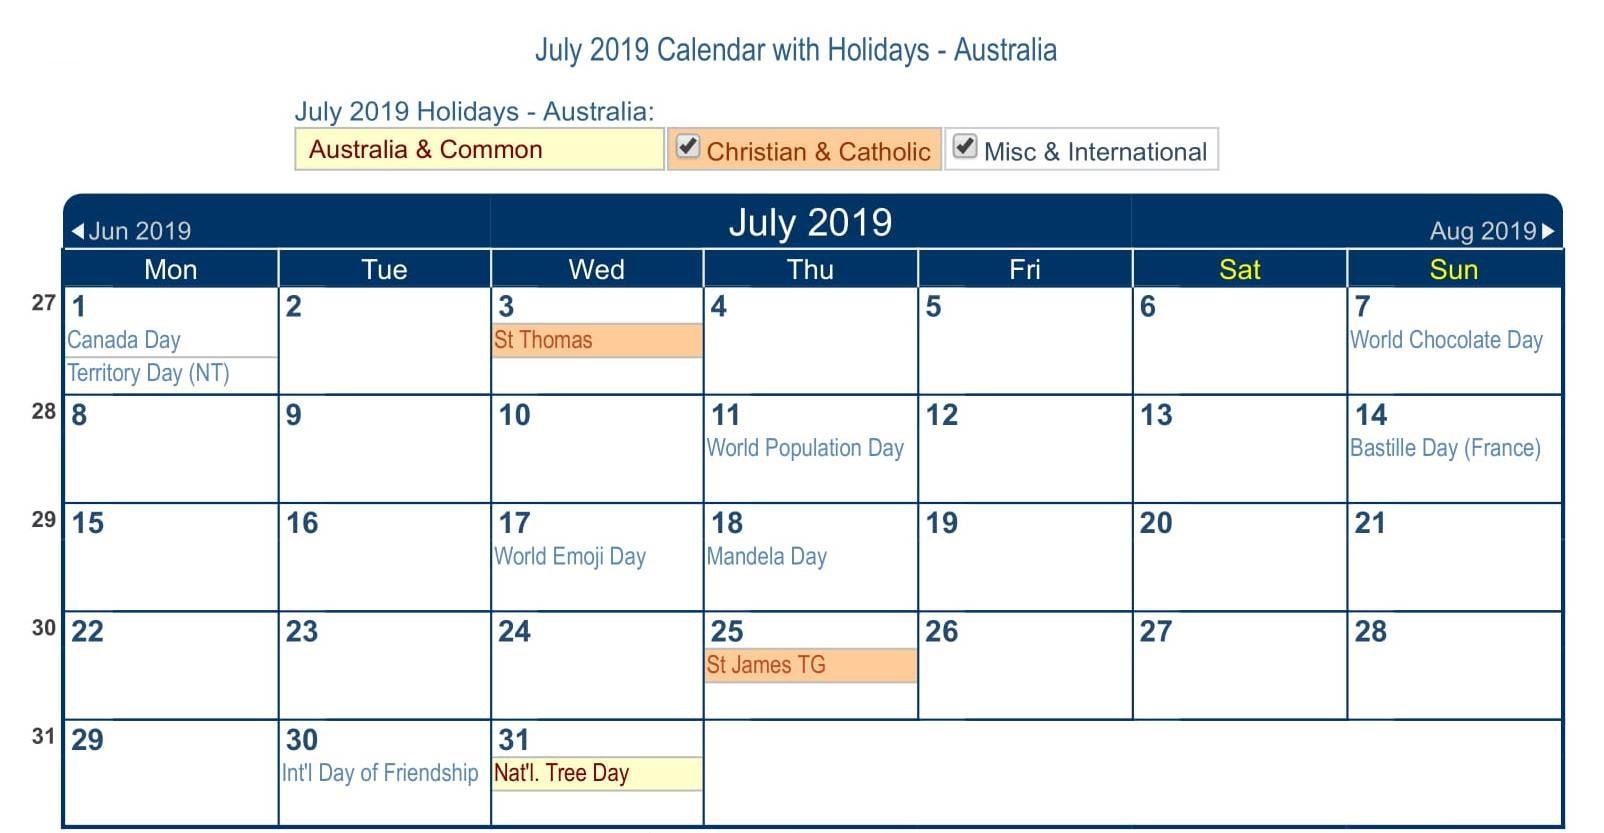 July 2019 Calendar Australia with Holidays